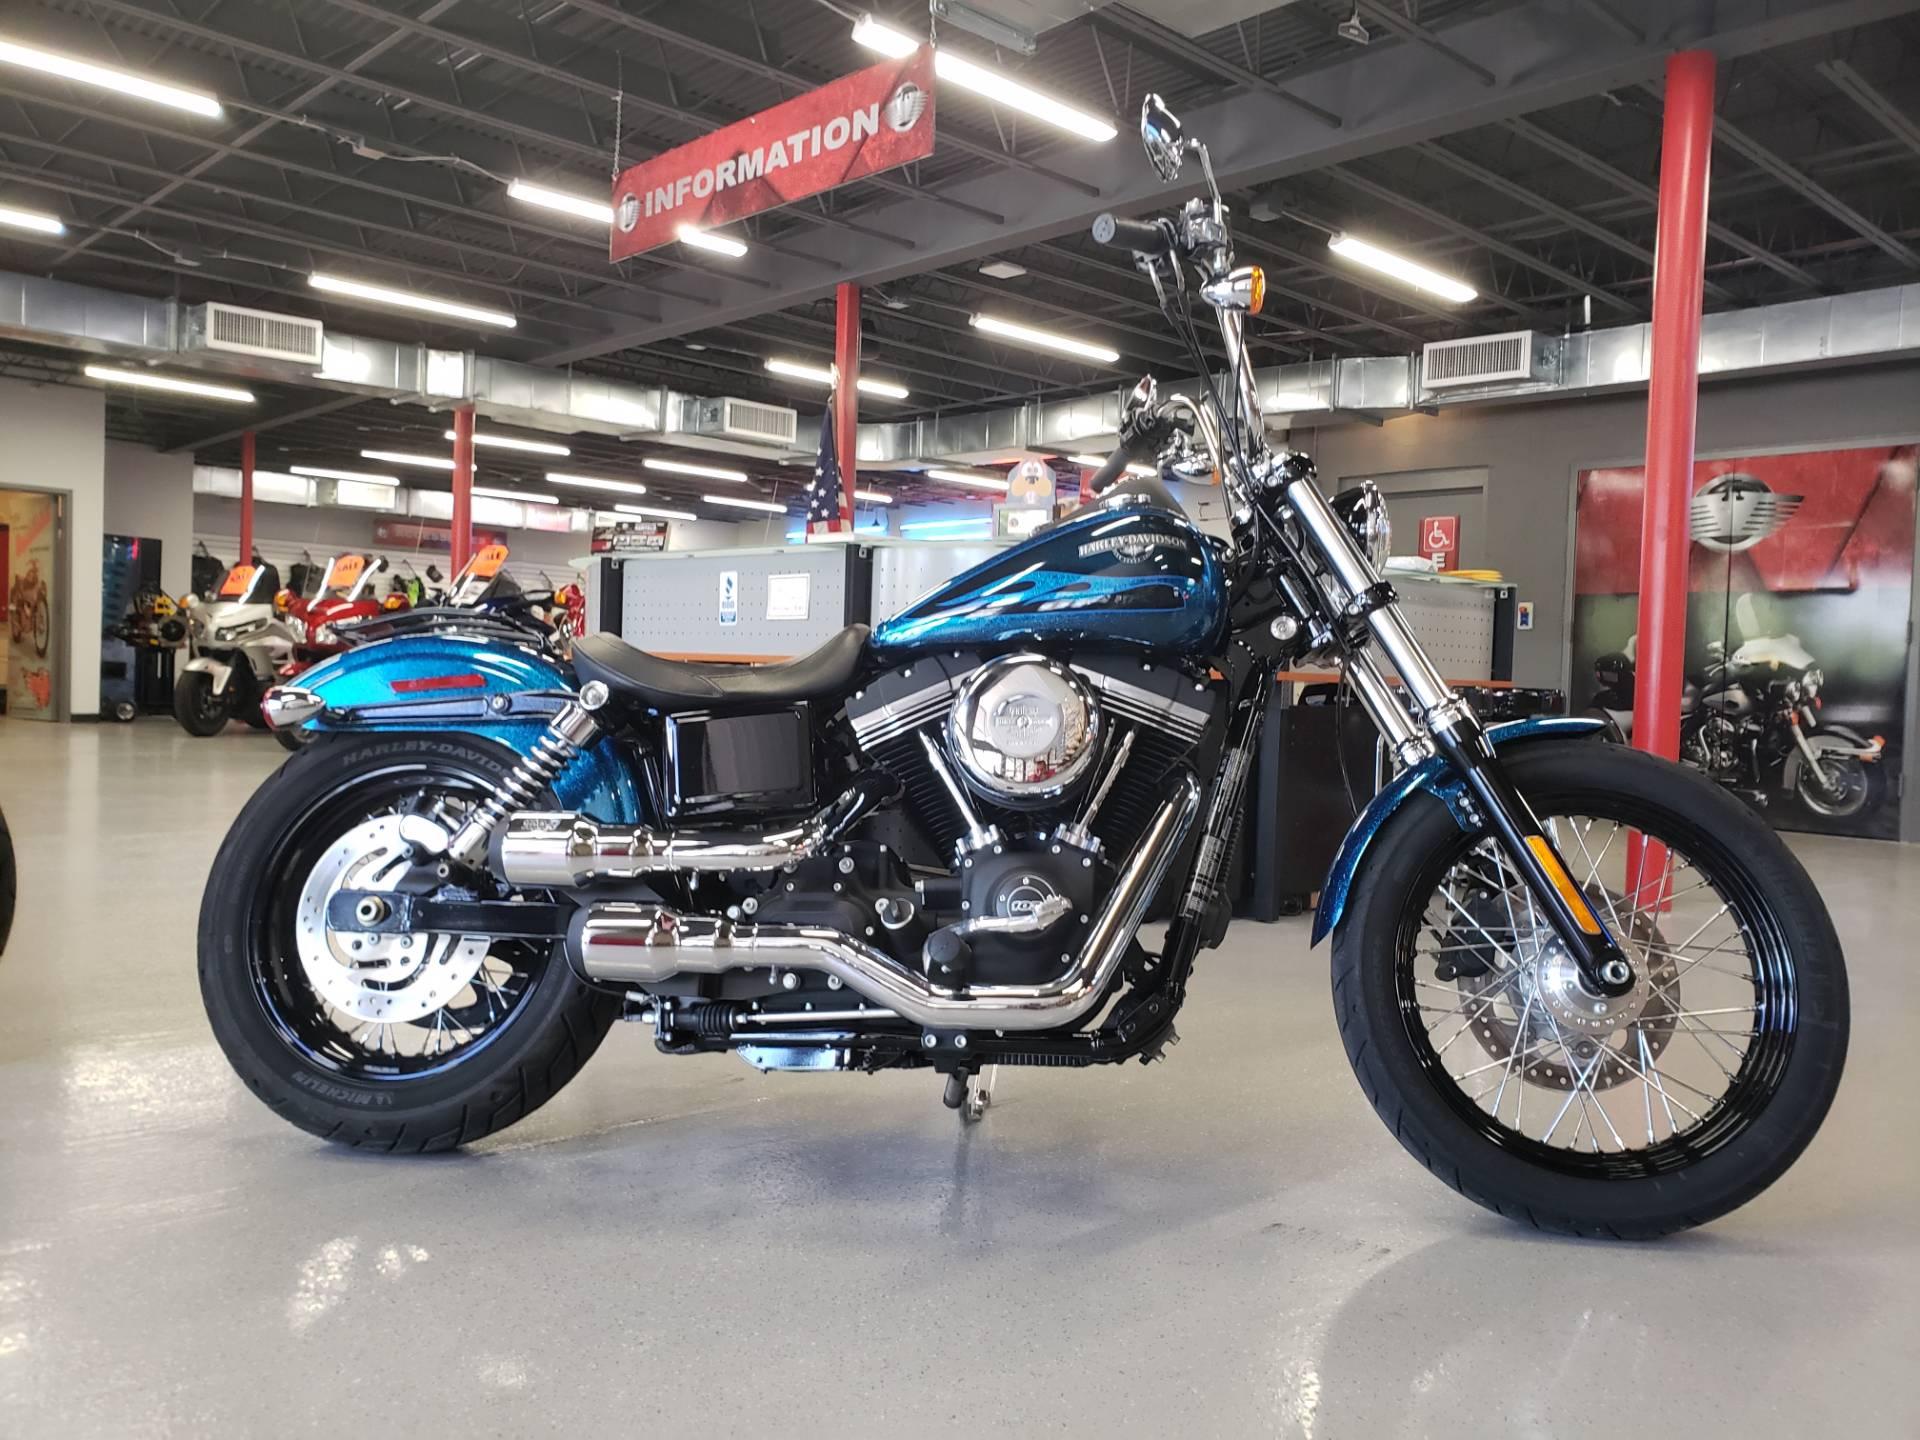 Used 2016 Harley Davidson Street Bob Motorcycles In Fort Myers Fl